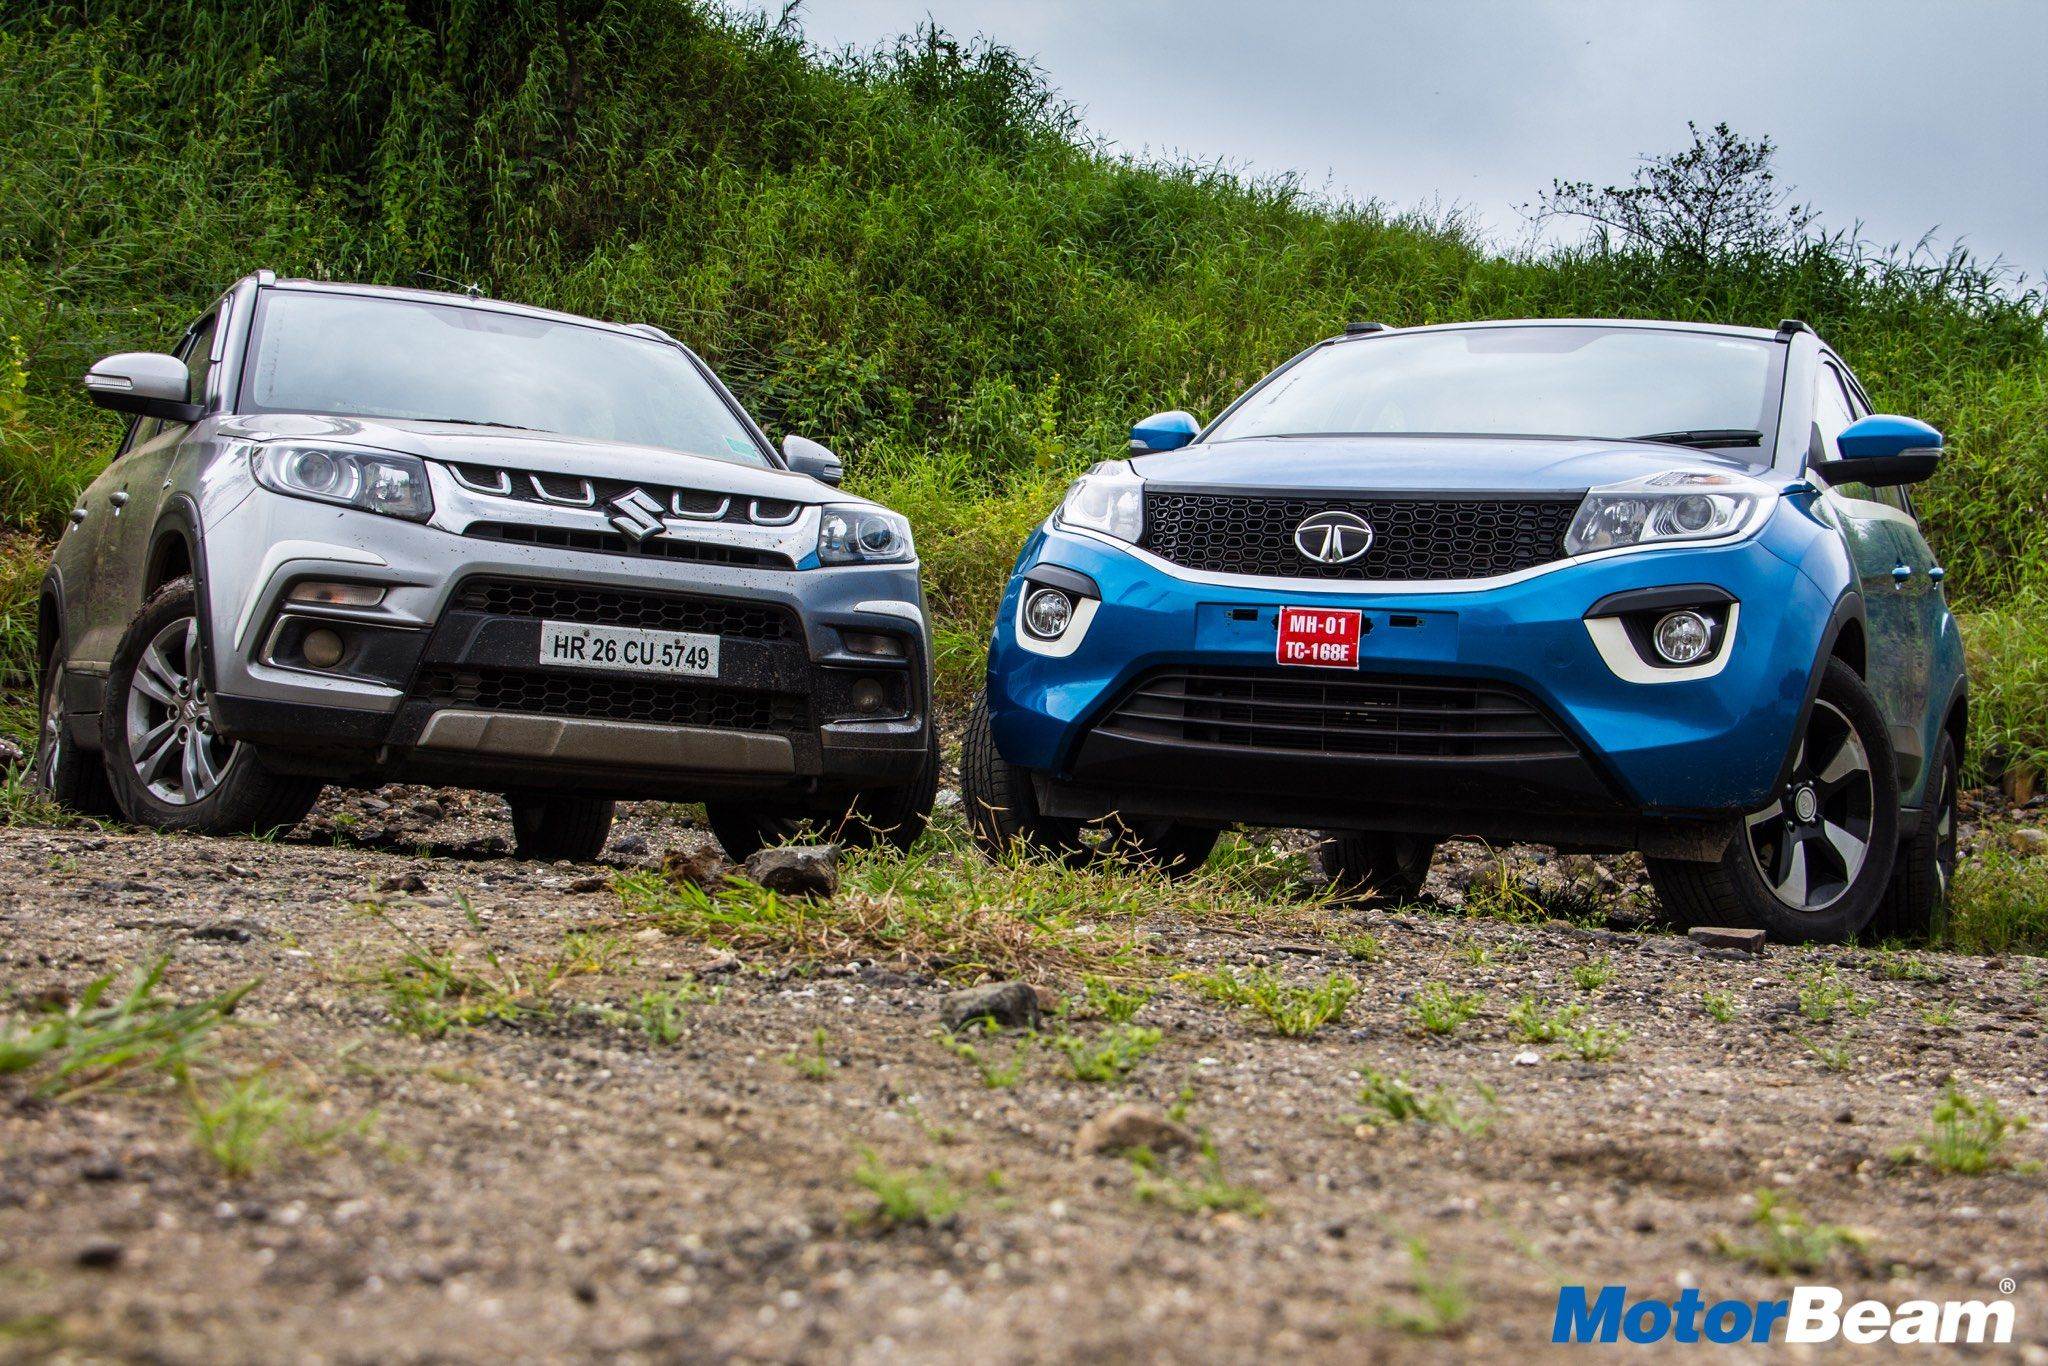 Tata Nexon Vs Maruti Vitara Brezza Comparison Review Bike News Bmw Car Toy Car